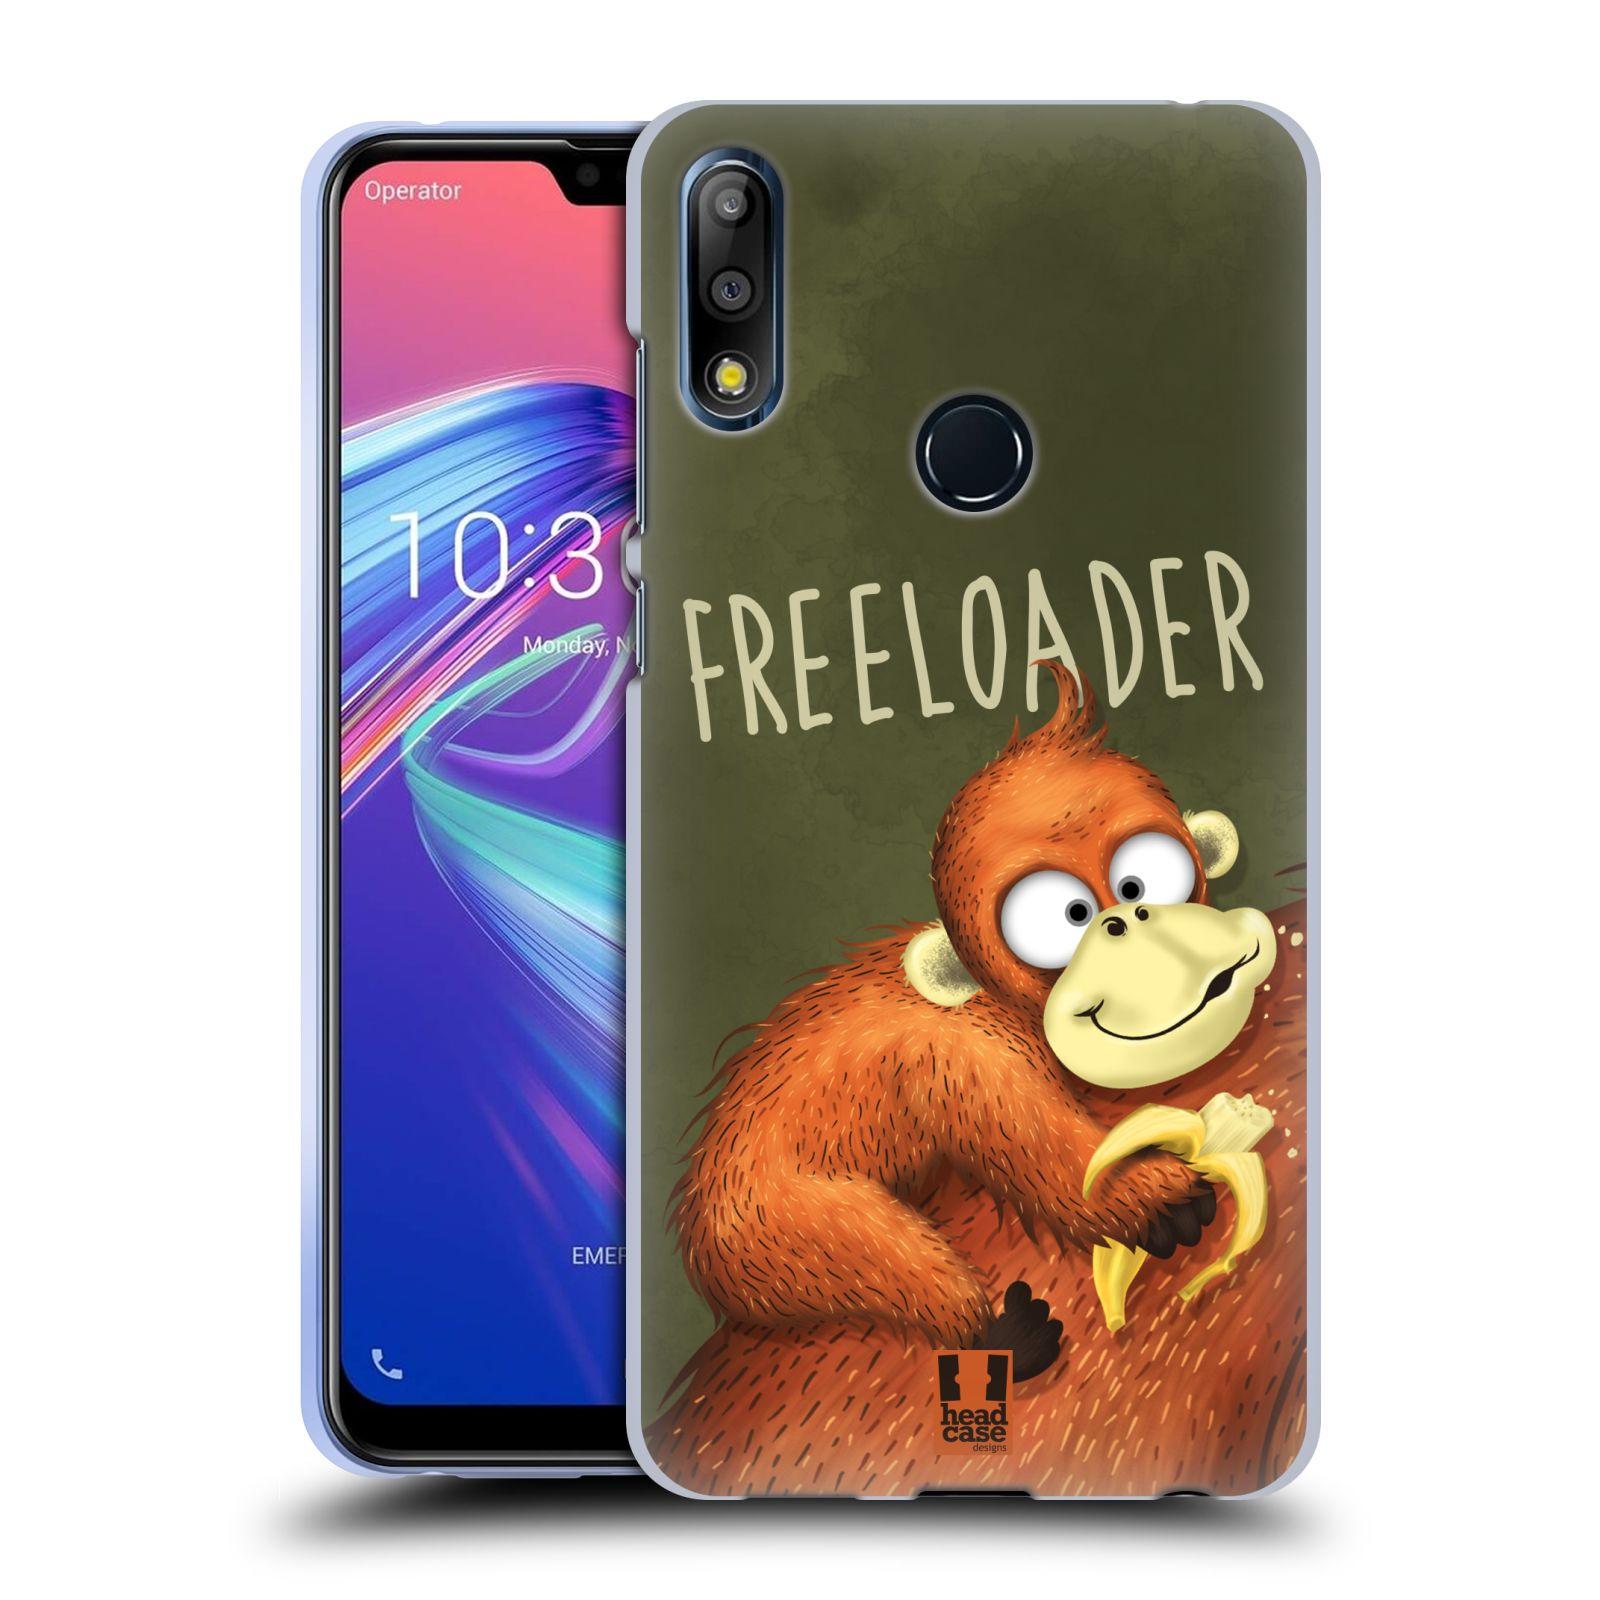 Silikonové pouzdro na mobil Asus Zenfone Max Pro M2 ZB631KL - Head Case - Opičák Freeloader